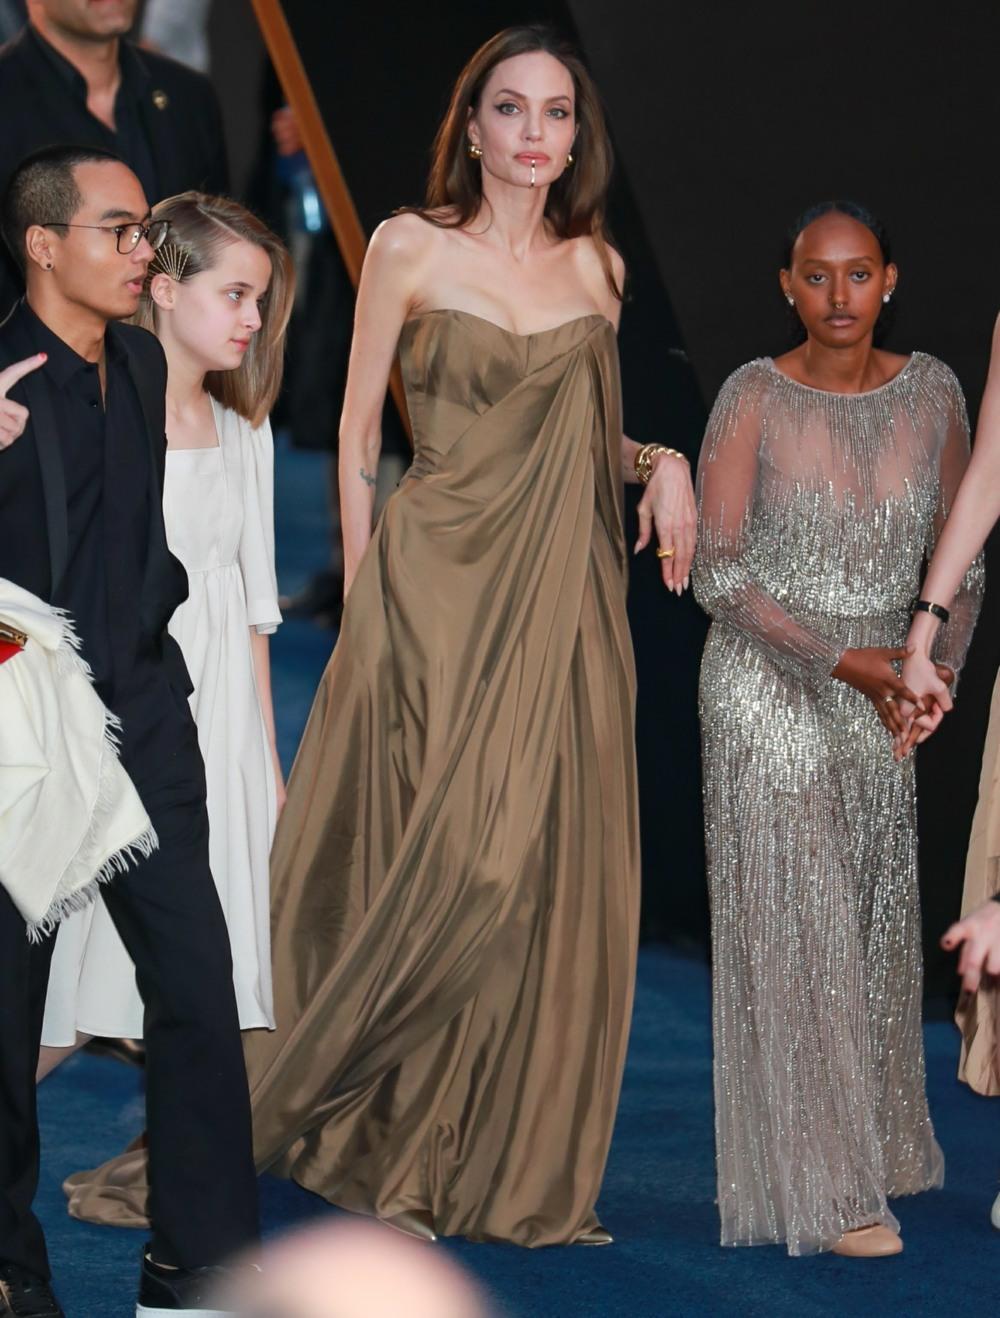 Angelina Jolie wore Balmain & brought her kids to 'The Eternals' premiere